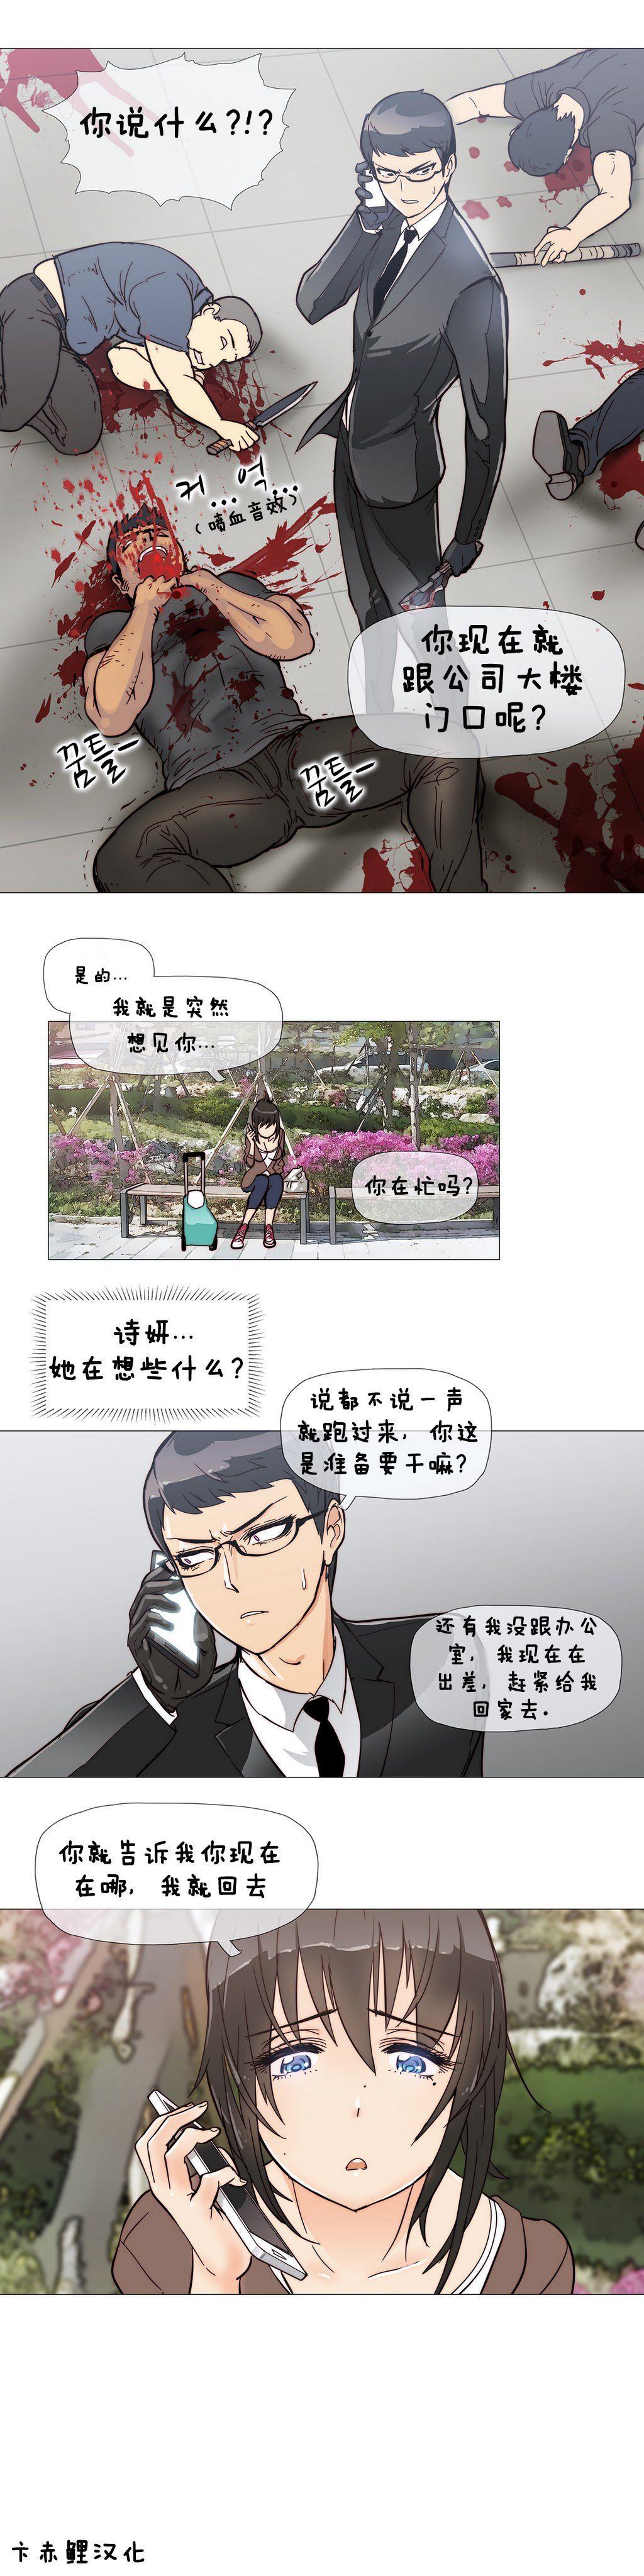 HouseHold Affairs 【卞赤鲤汉化】1~15话 81